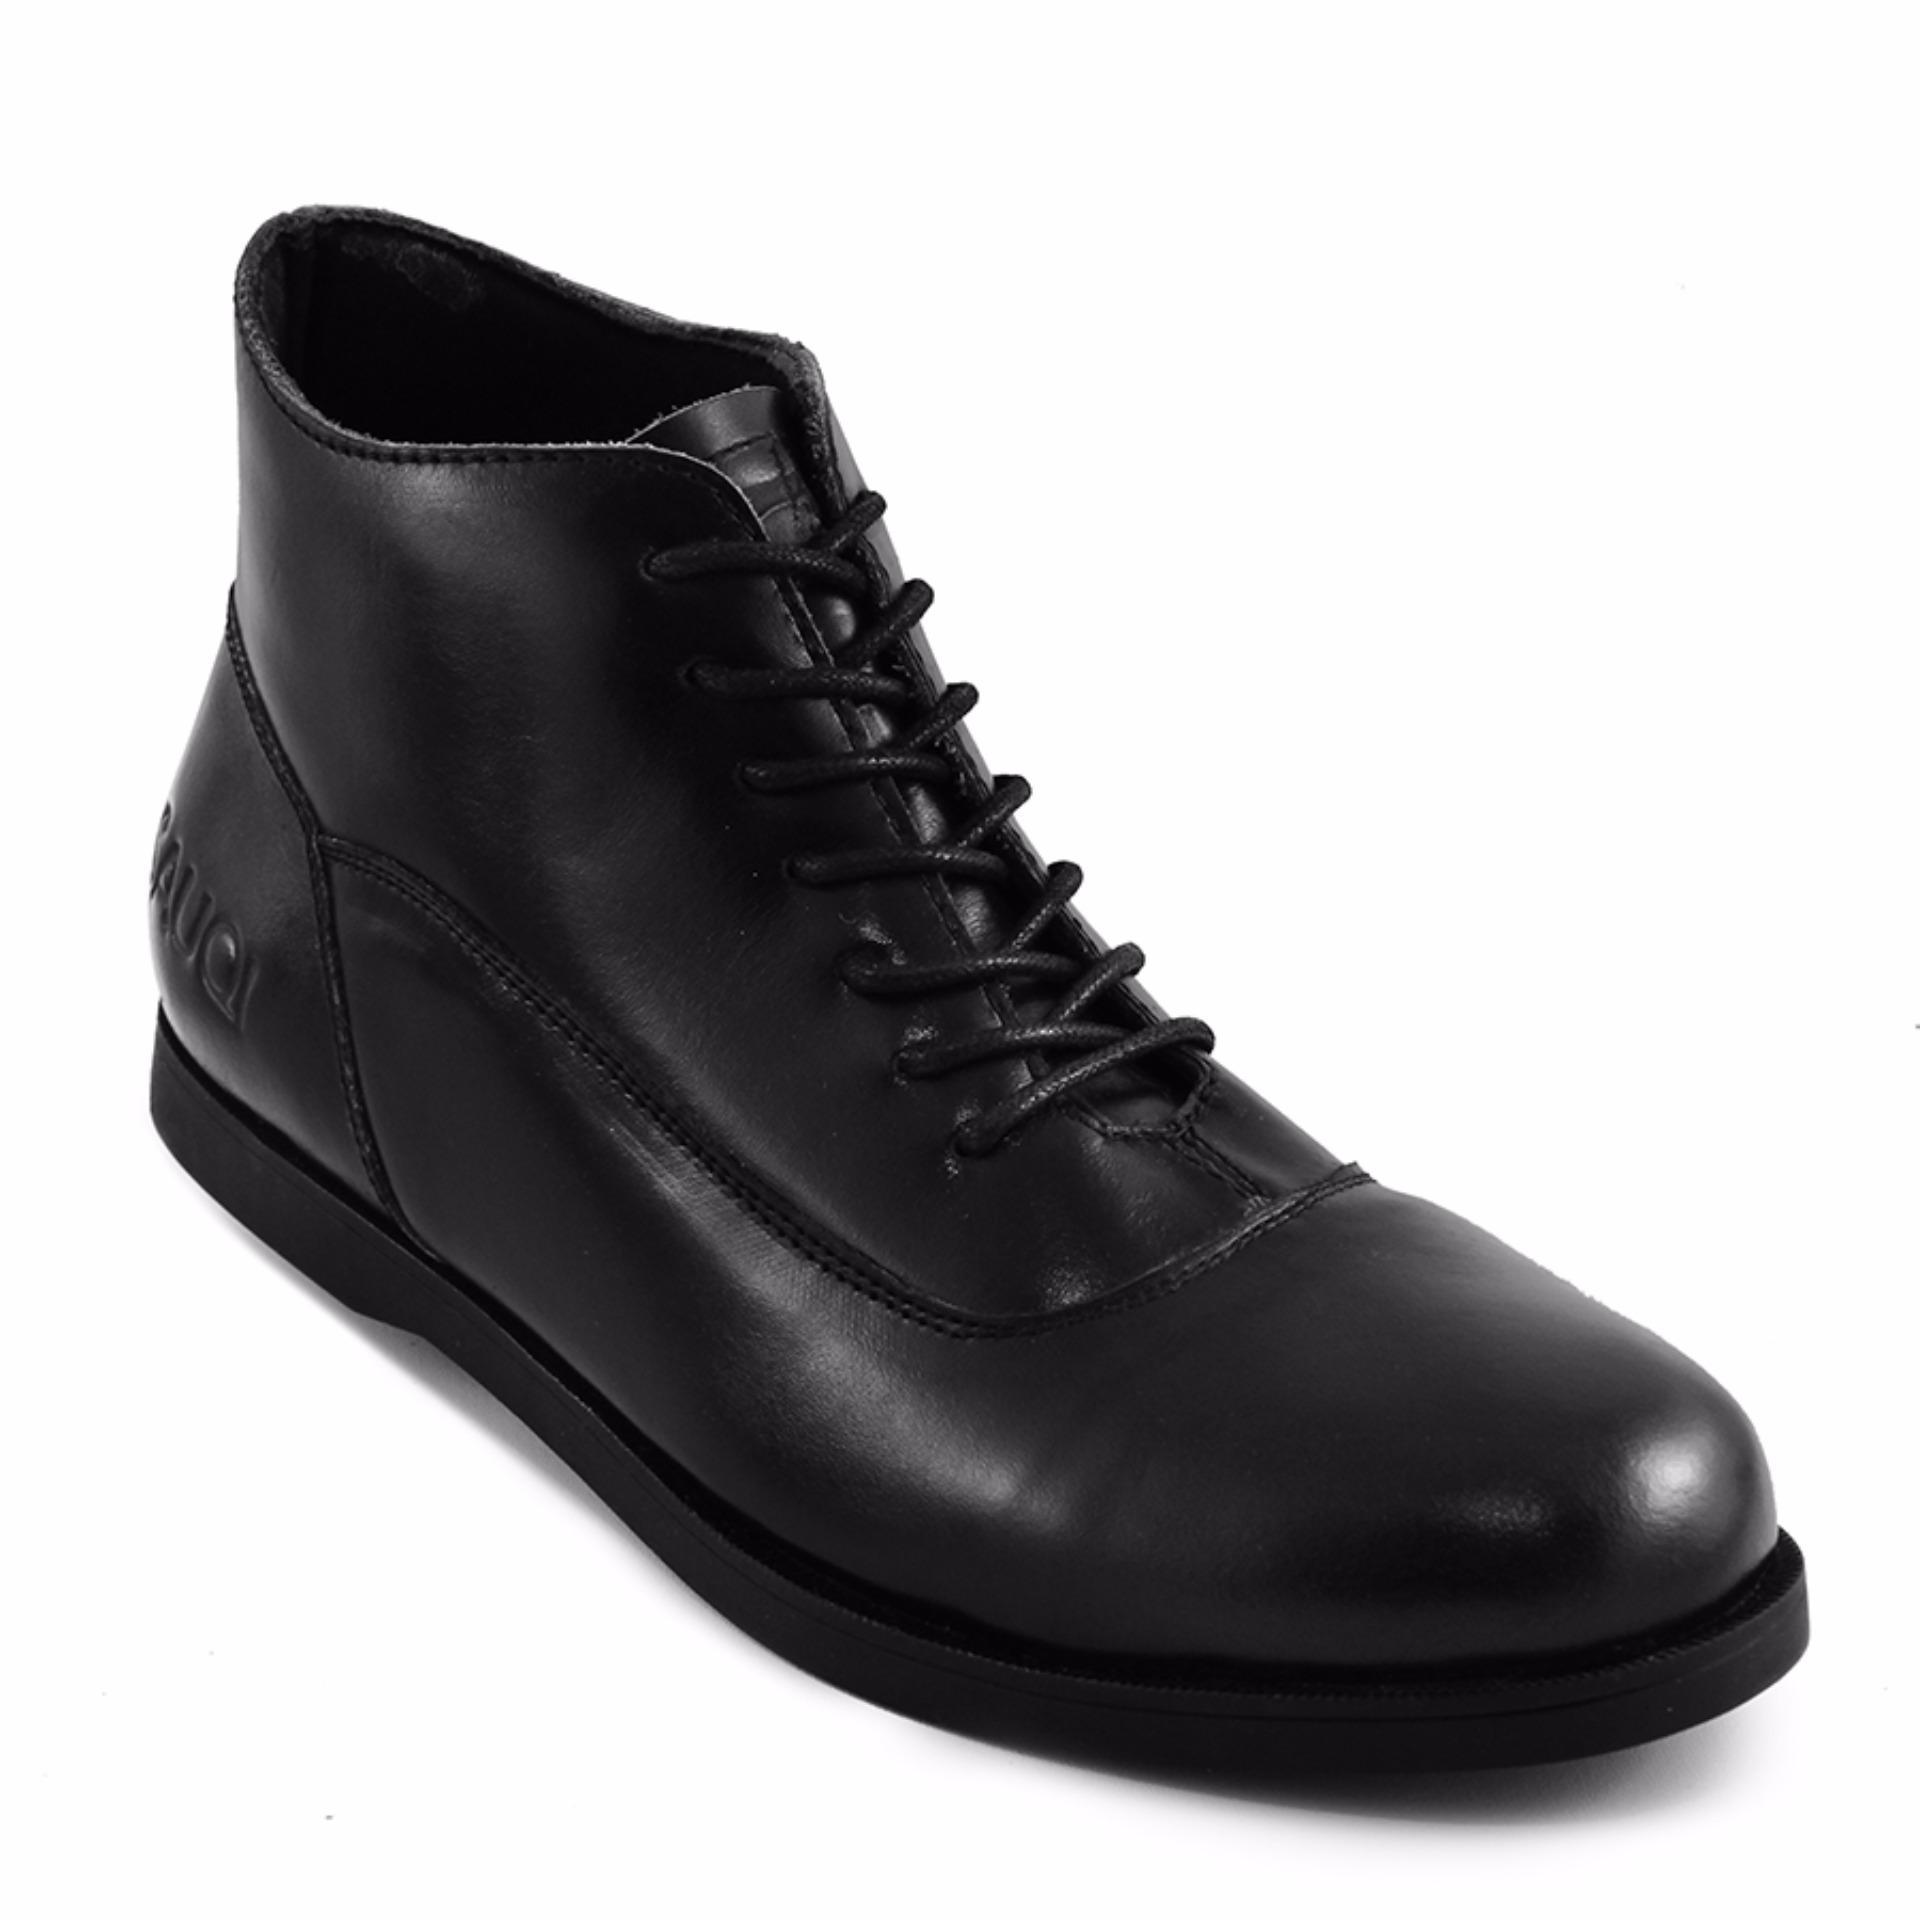 Spek Sauqi Footwear Spectre Sepatu Kulit Asli Boots Pria Casual Formal Kantor Black Jawa Barat